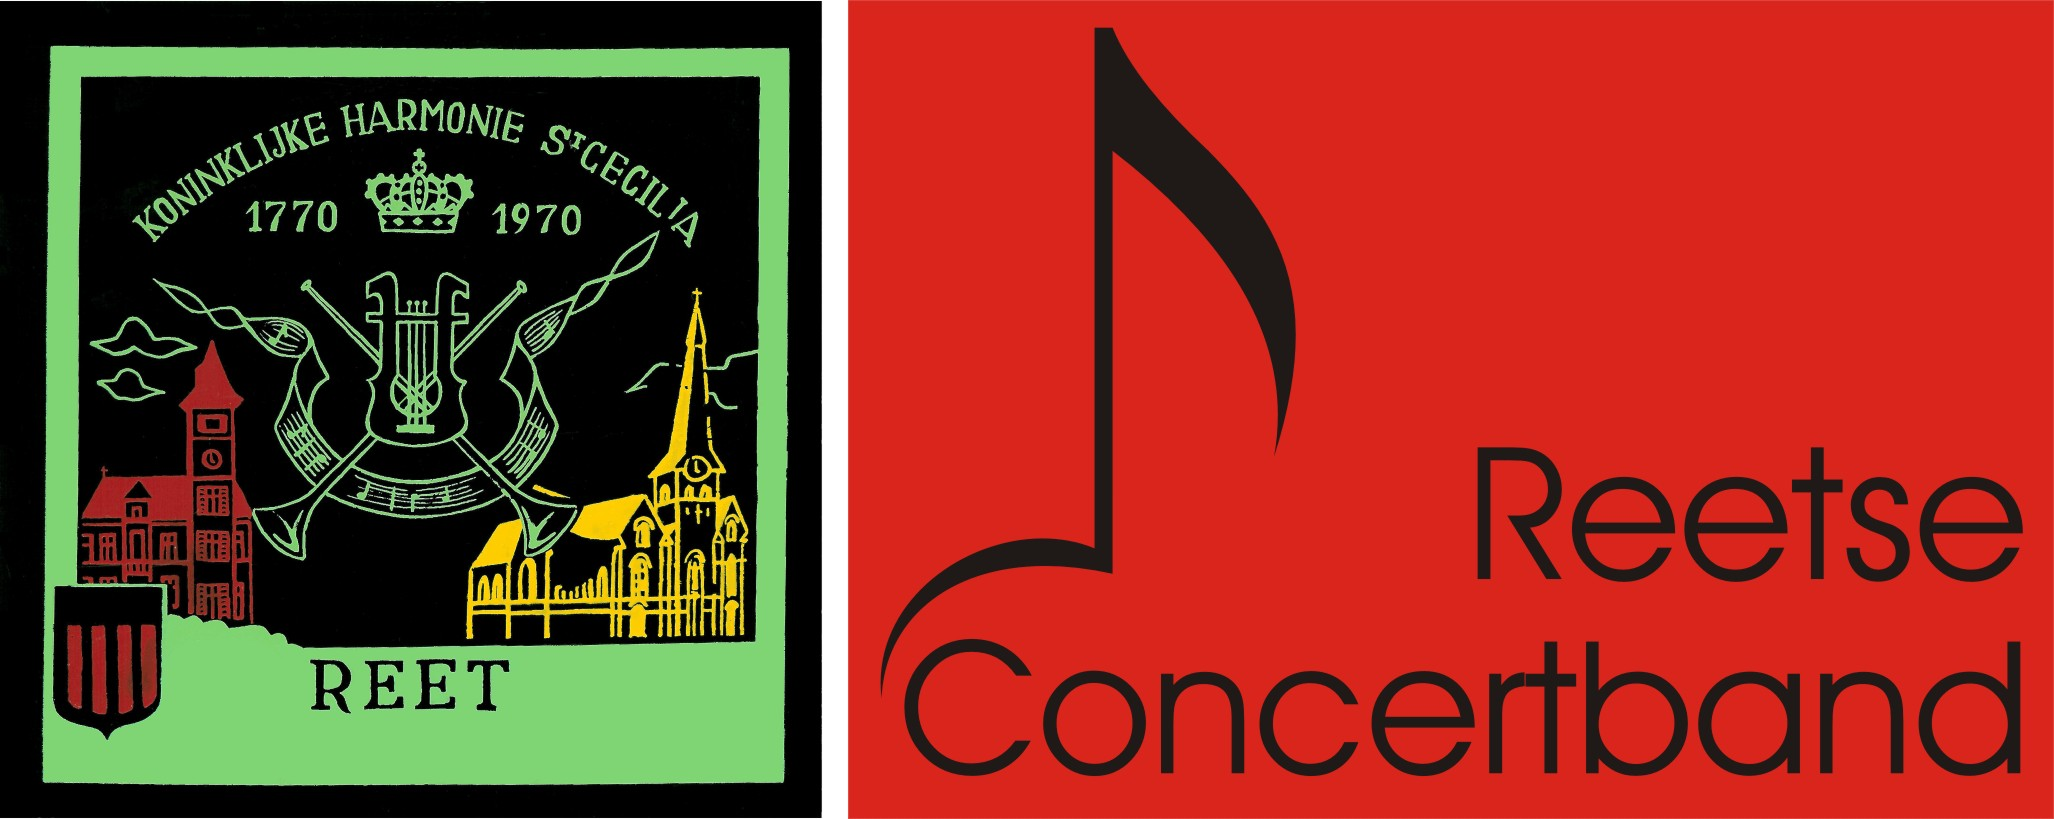 logo Harmonie Sint-Cecilia Reet en Reetse Concertband